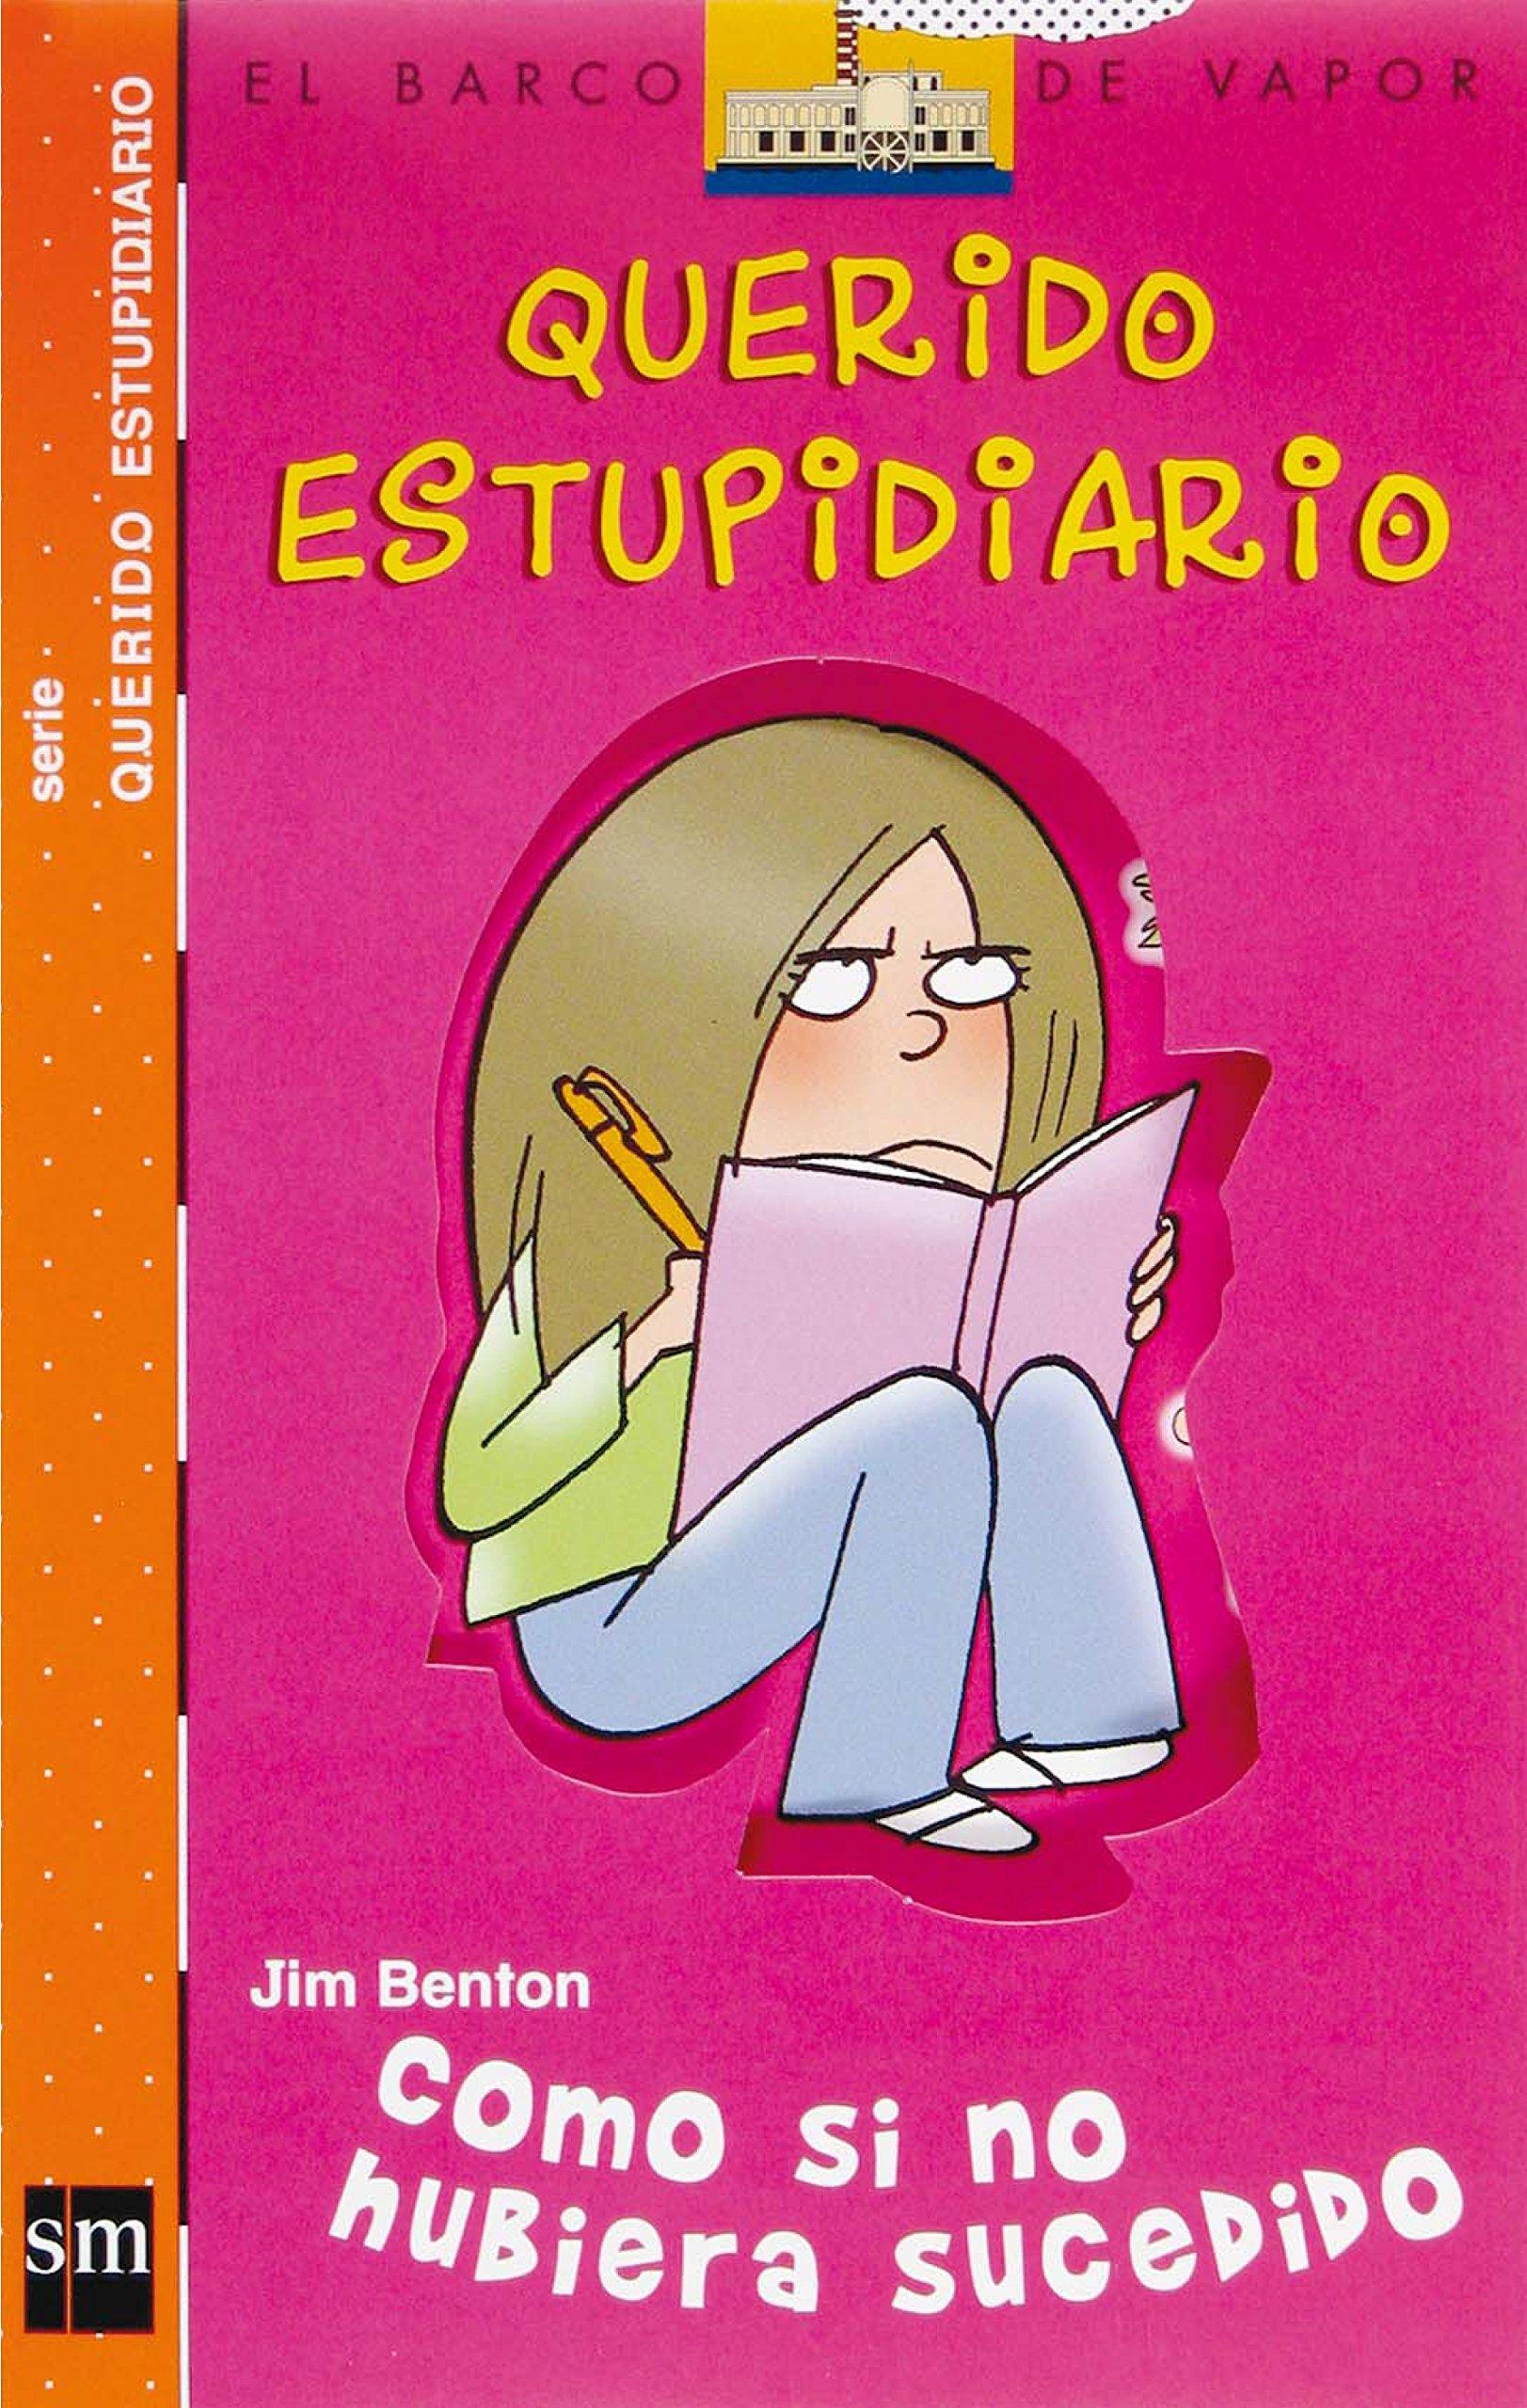 Querido Estupidiario: Como SI No Hubiera Sucedido (Spanish Edition) (Spanish) Paperback